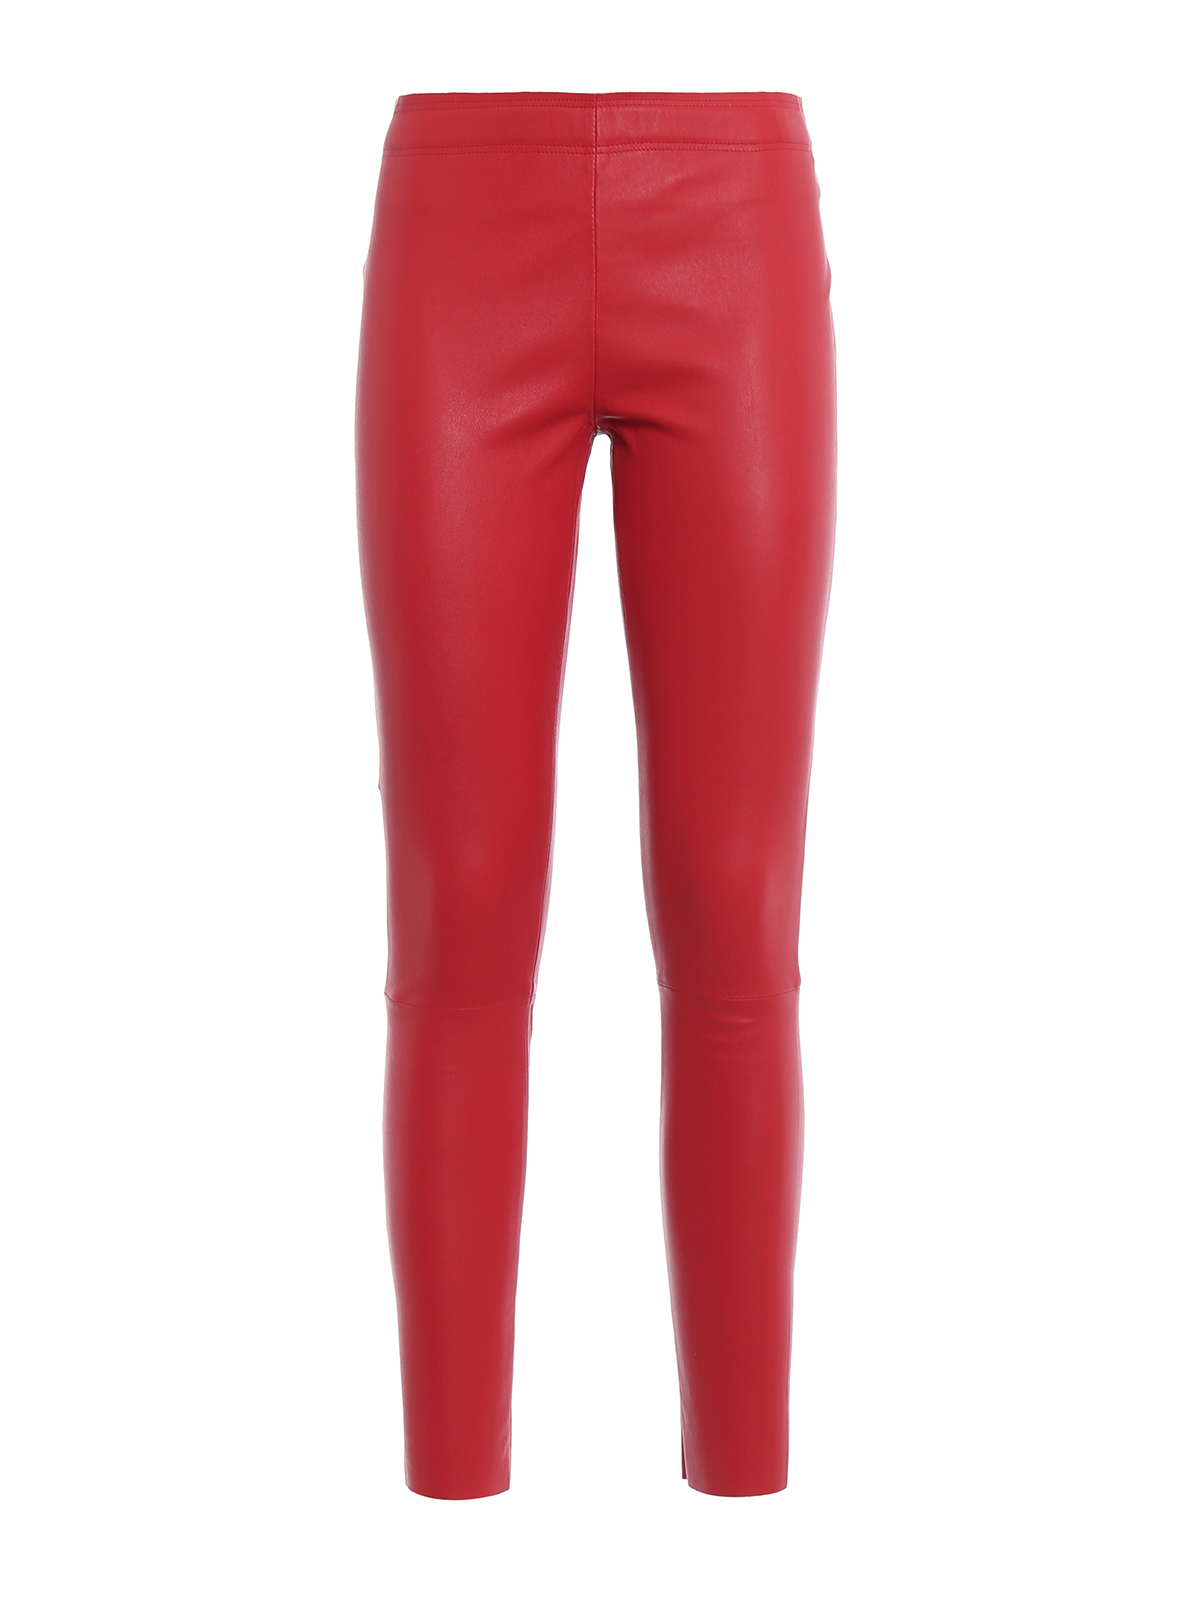 311e51b0e2 Frida Muse - Leggings in pelle stretch rossa - pantaloni in pelle ...